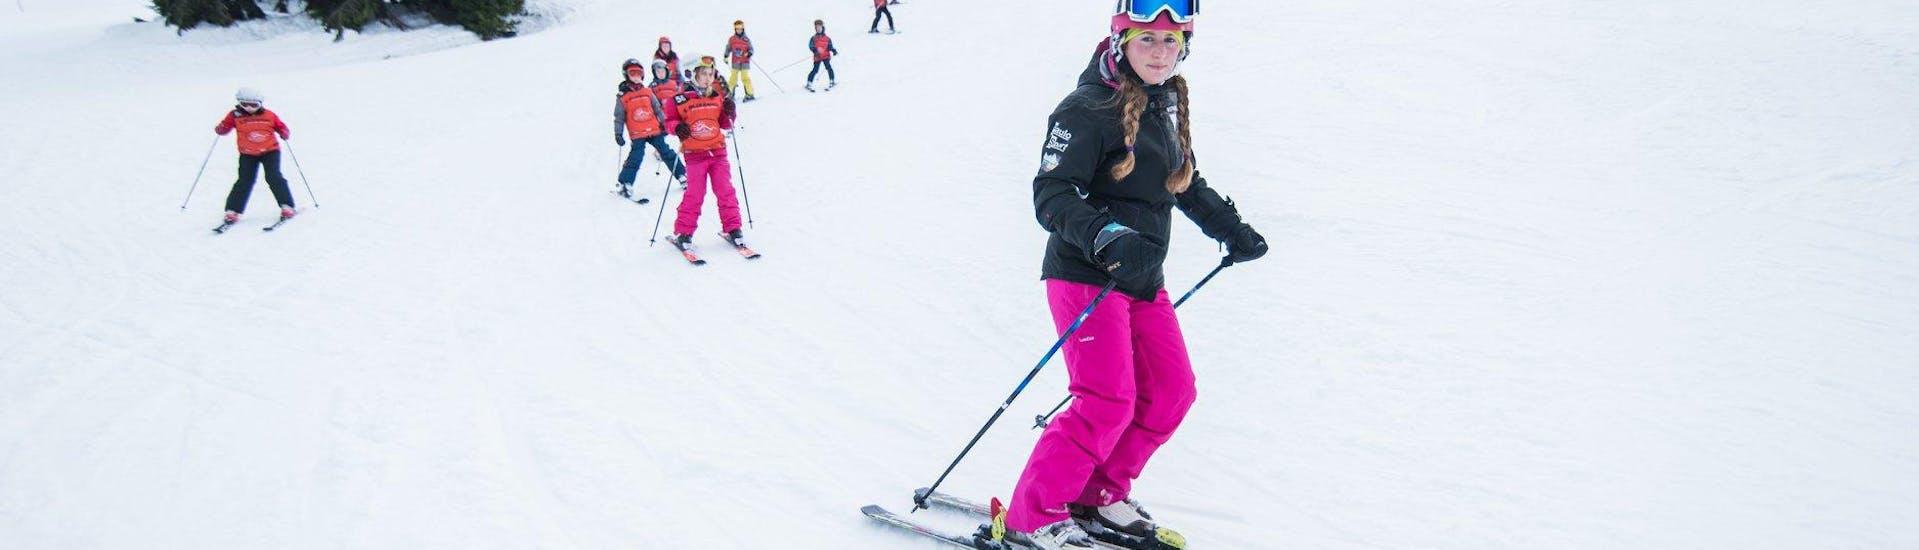 Ski Lessons for Kids (4,5-15 years) - Advanced with Szkola Narciarska Snow4fun - Hero image